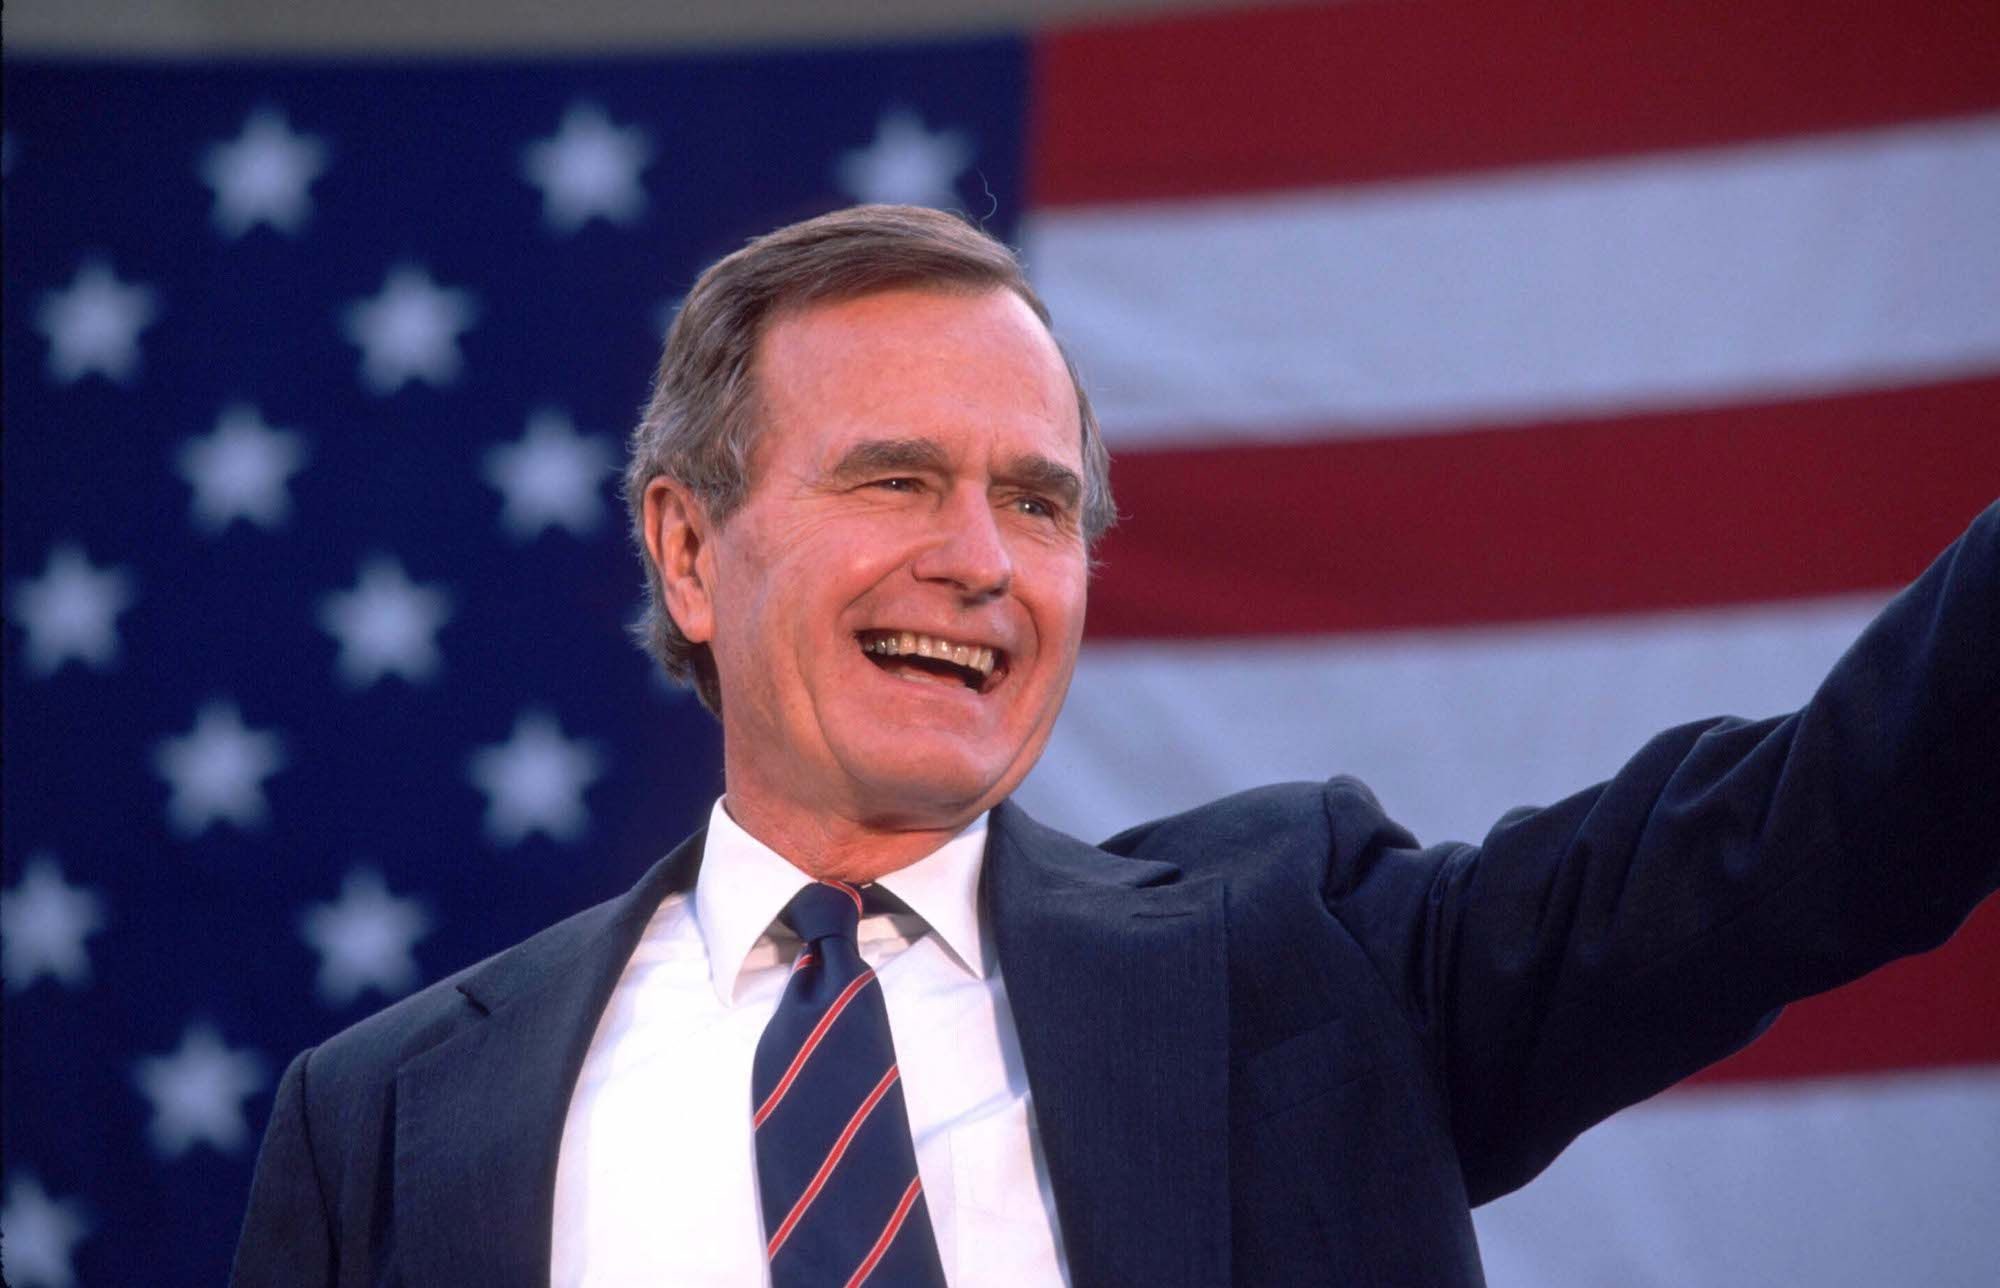 Saturday Night Live Paid Tribute to George H.W. Bush's Sense of Humor